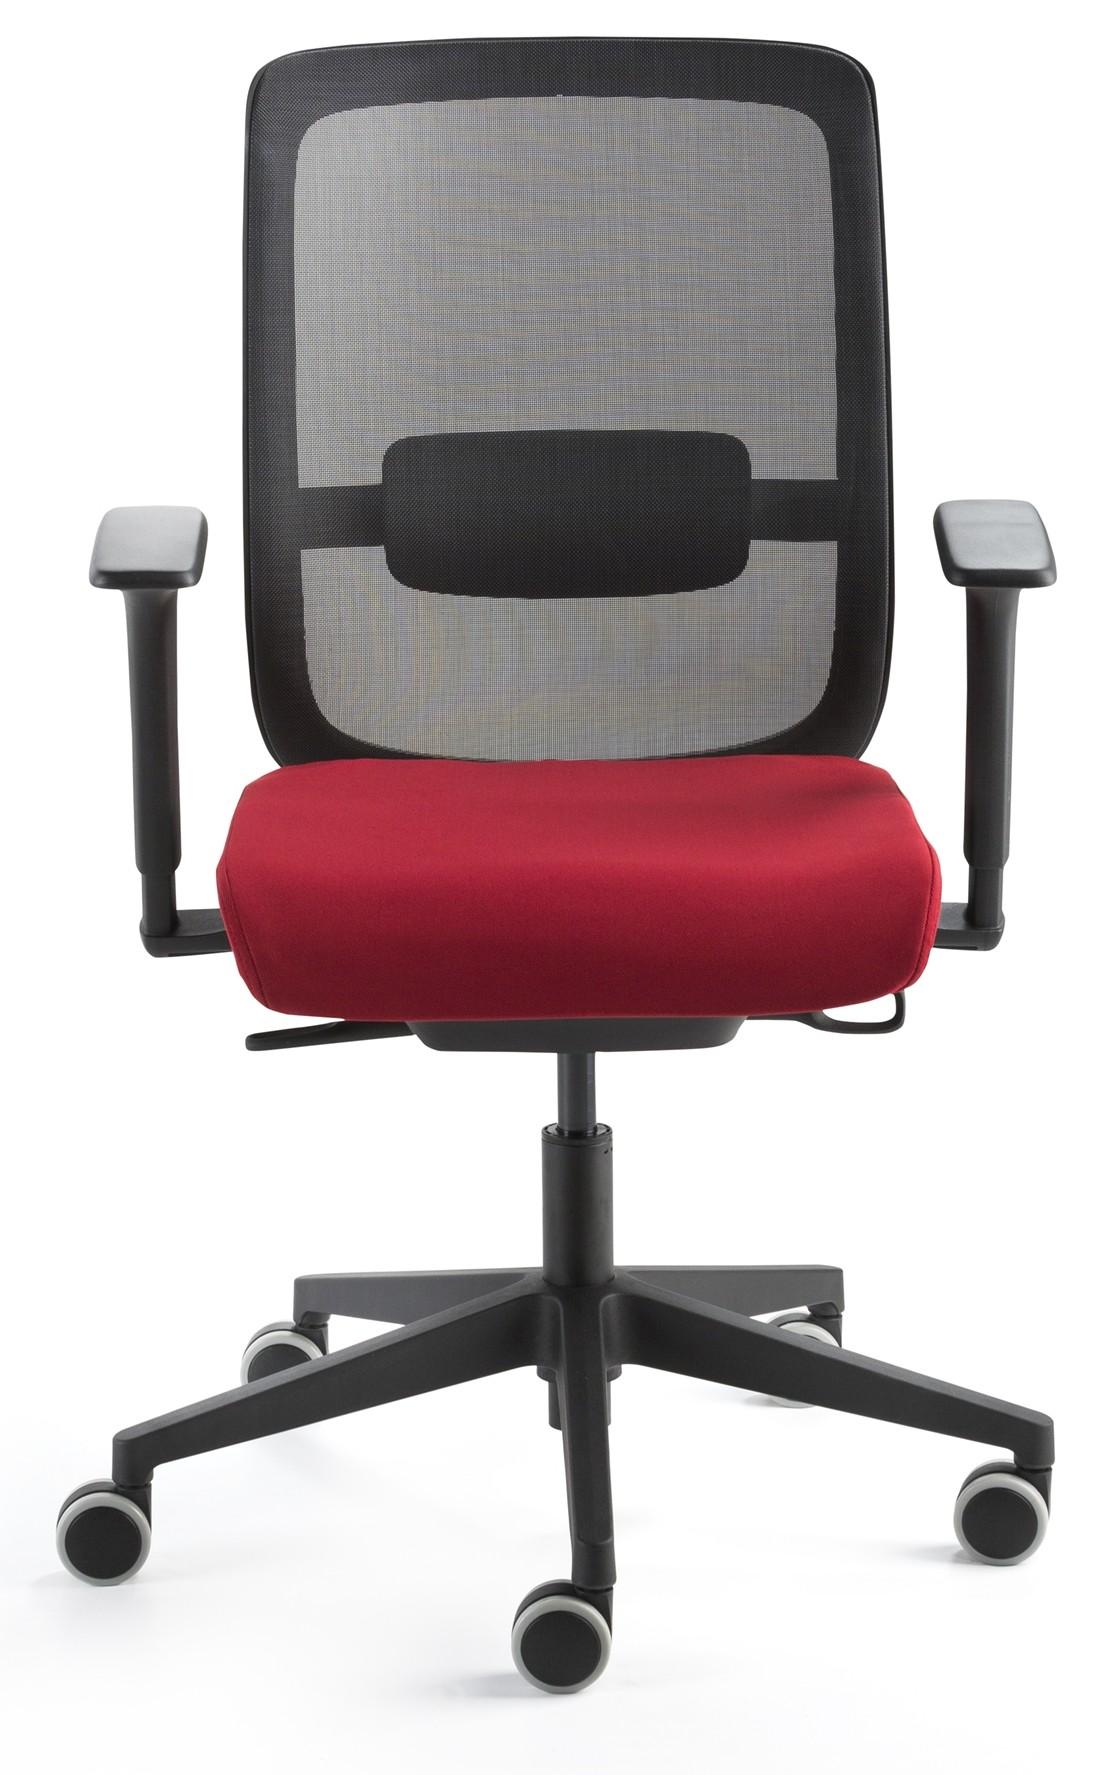 24Designs Bureaustoel Modena - Zwart - Rode Zitting